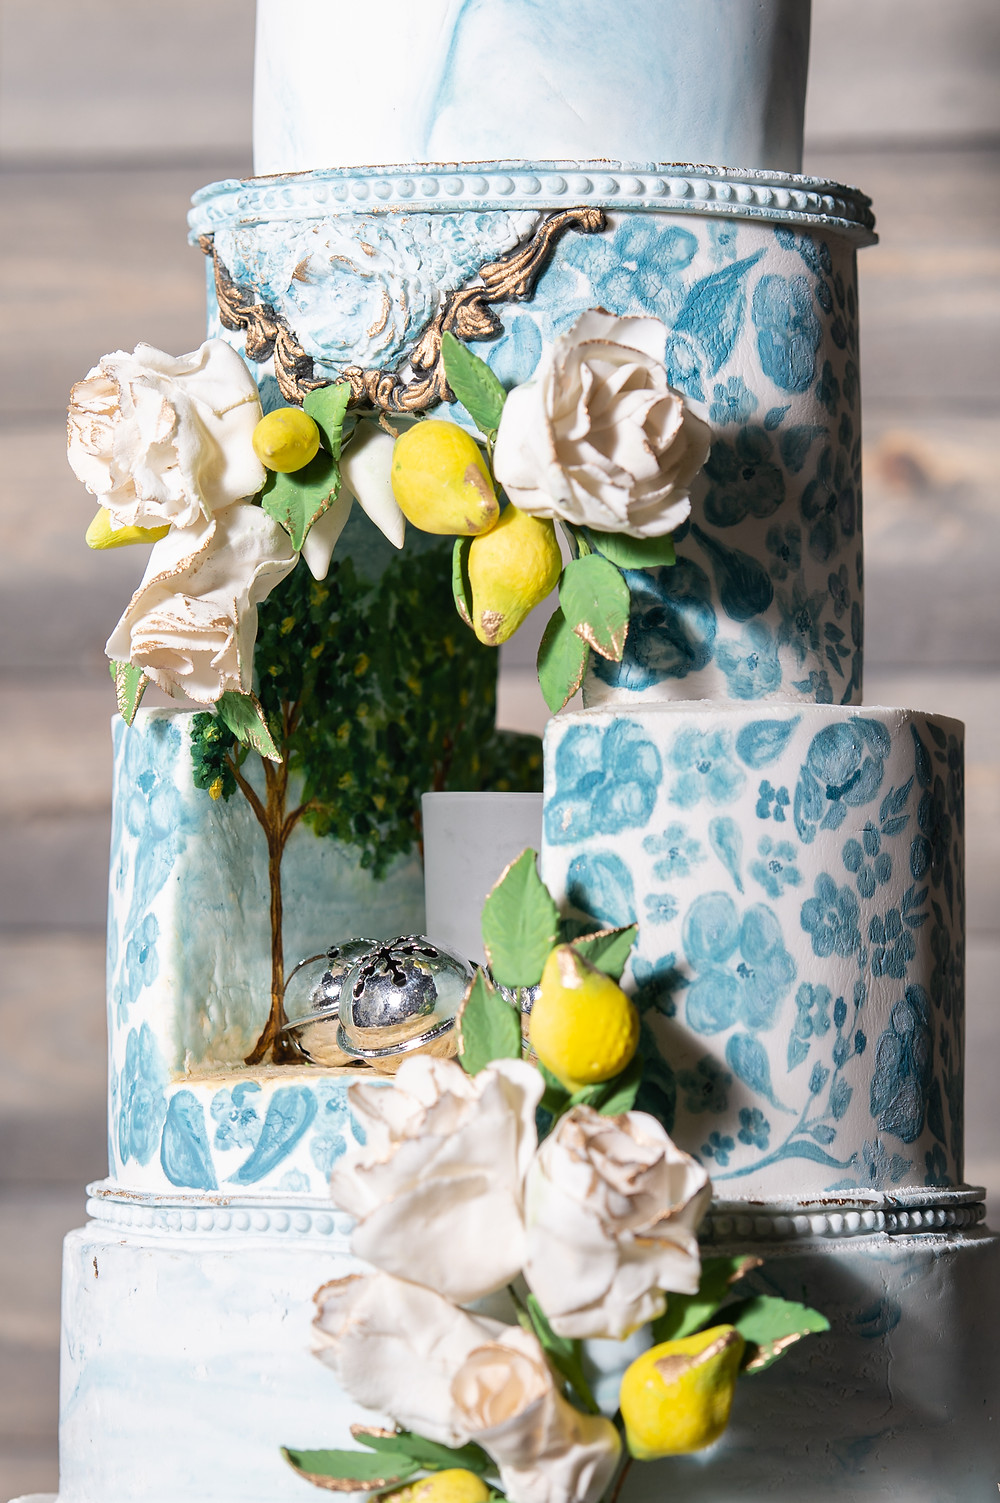 Detailed closeup of cake details